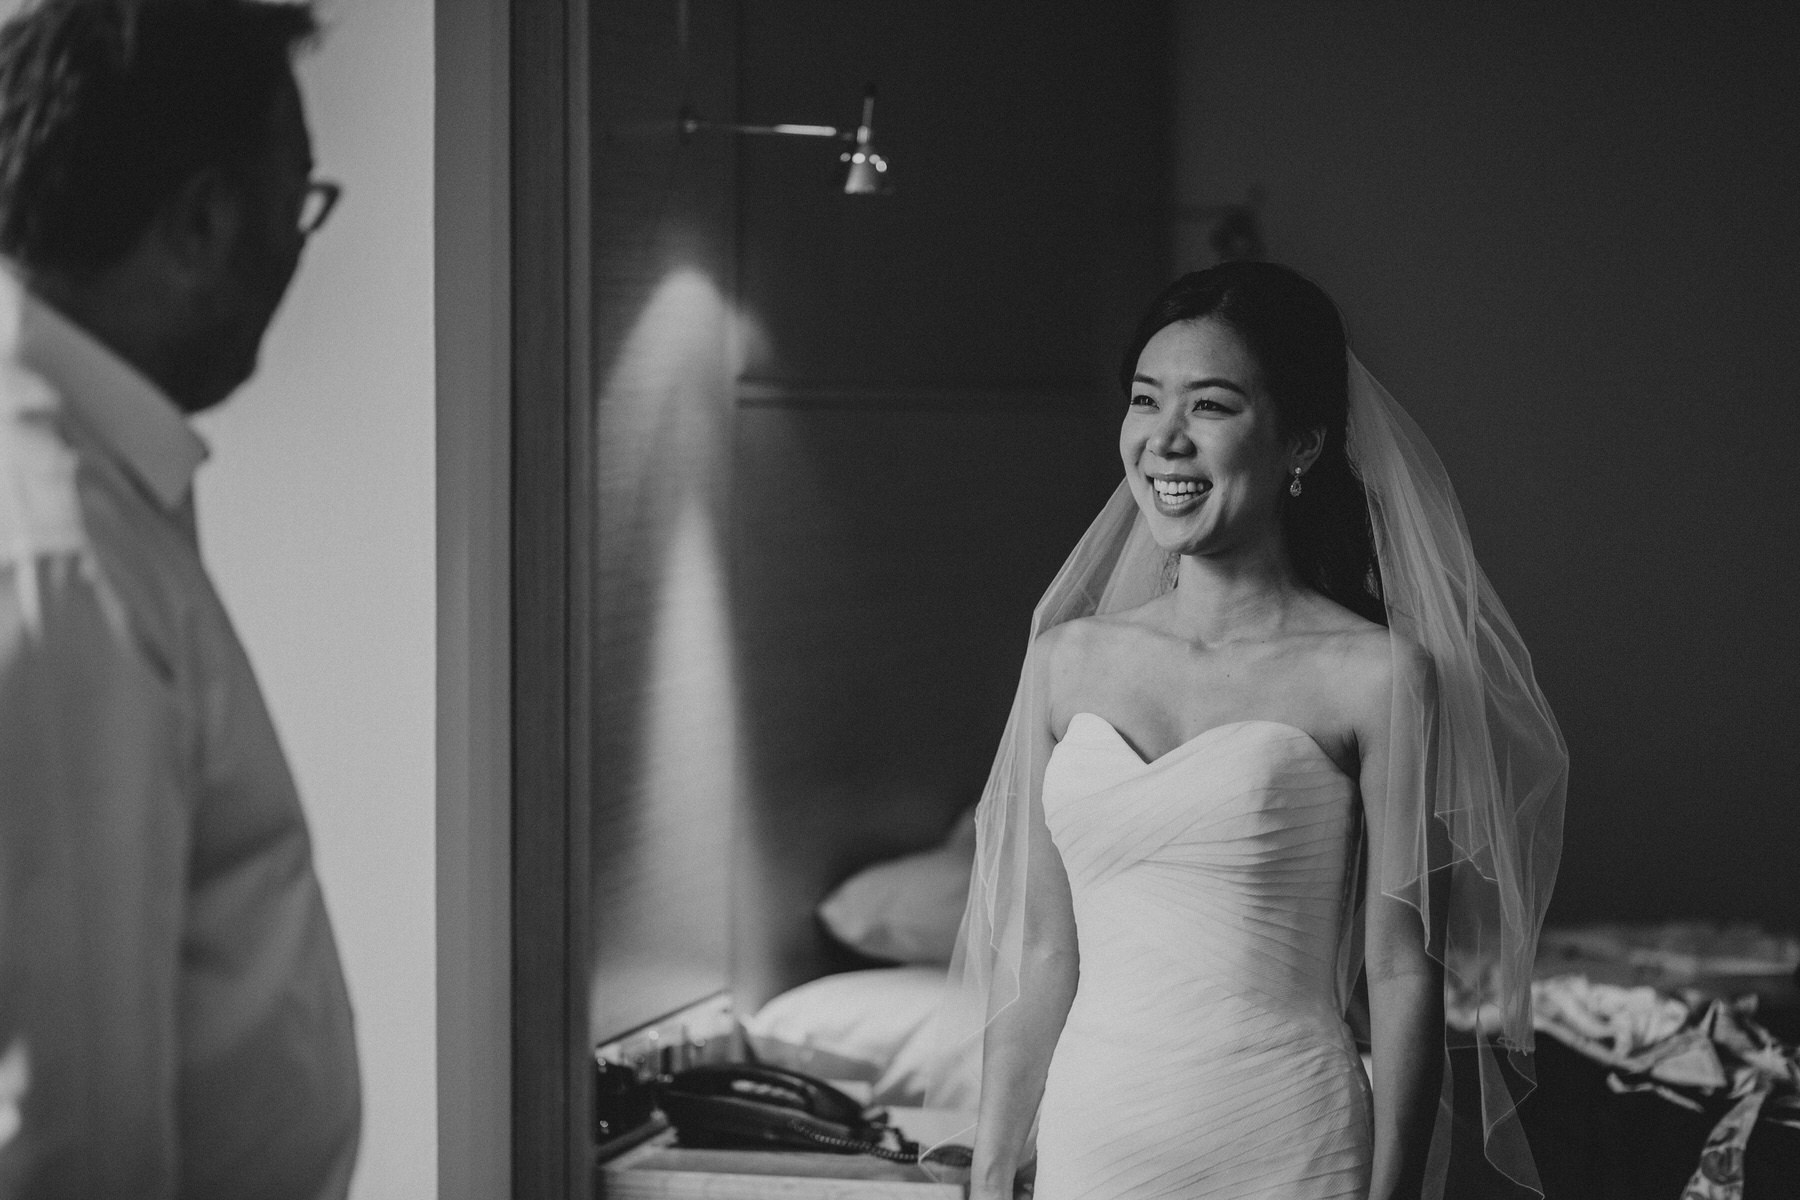 77 Severin Hubert wedding hairstylist moment with bride.jpg